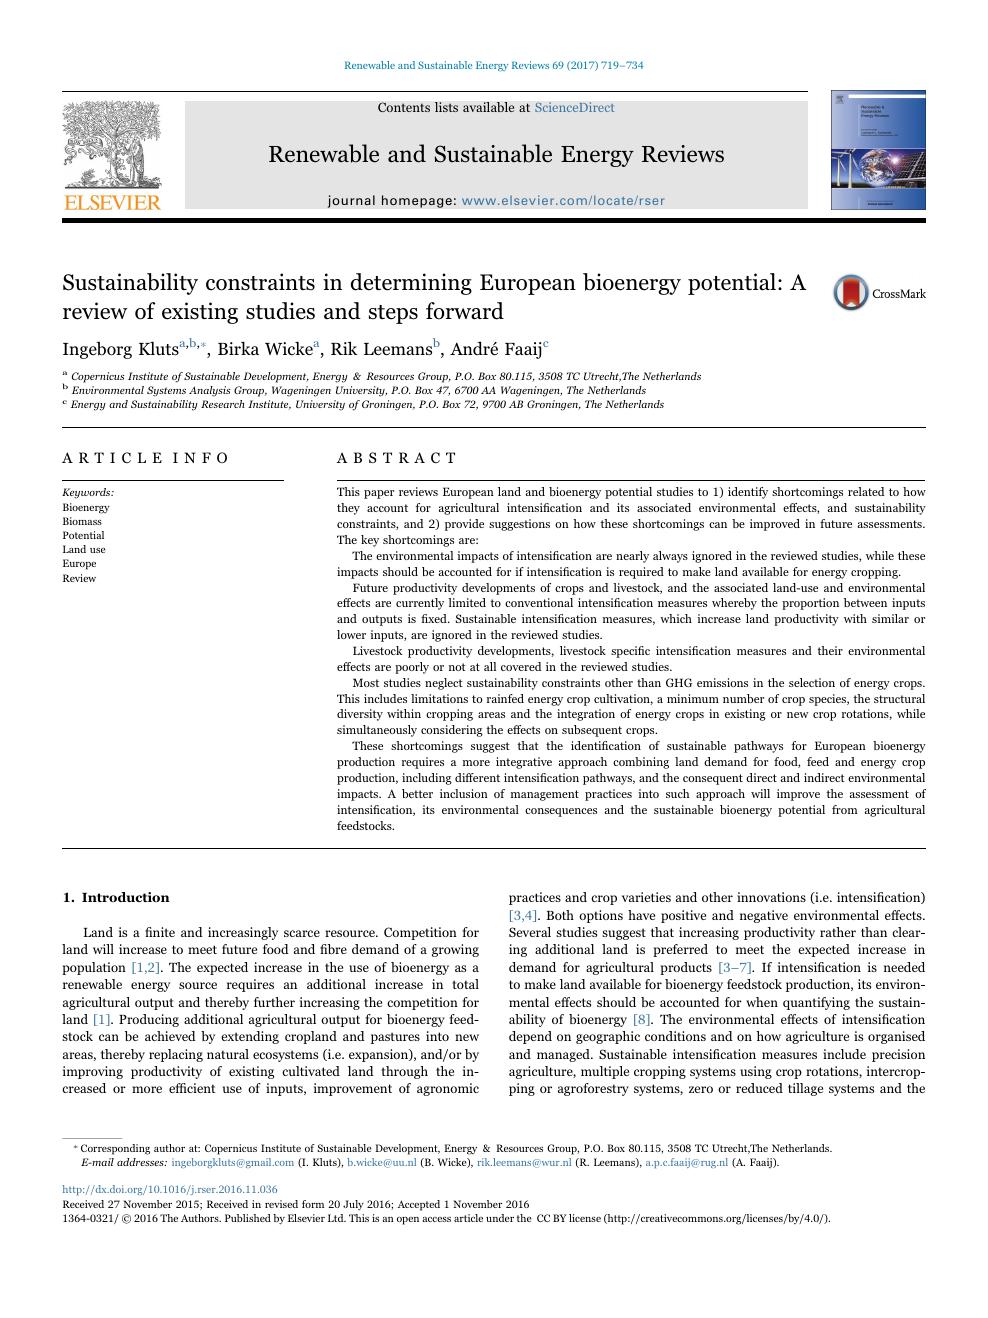 Sustainability constraints in determining European bioenergy